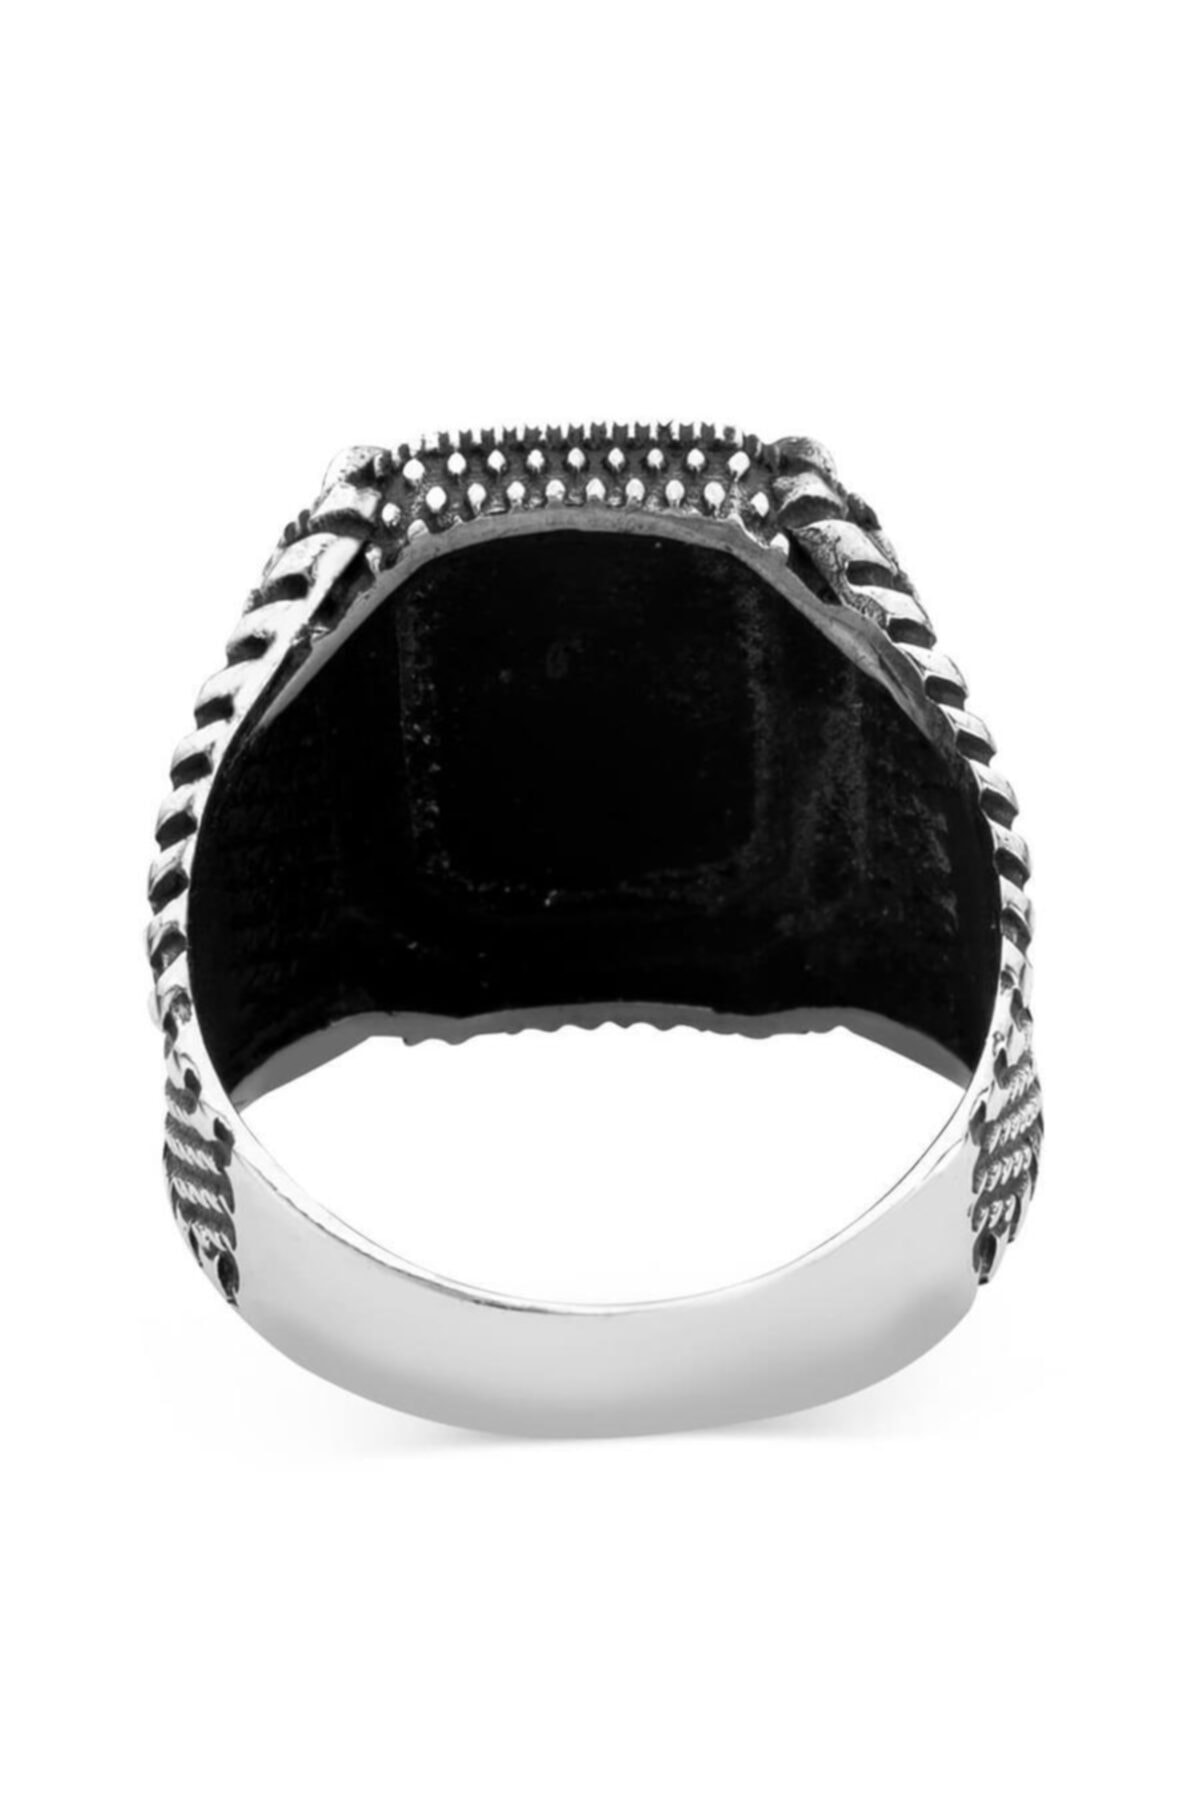 فروش انگشتر مردانه 2021 برند Anı Yüzük رنگ مشکی کد ty31301624